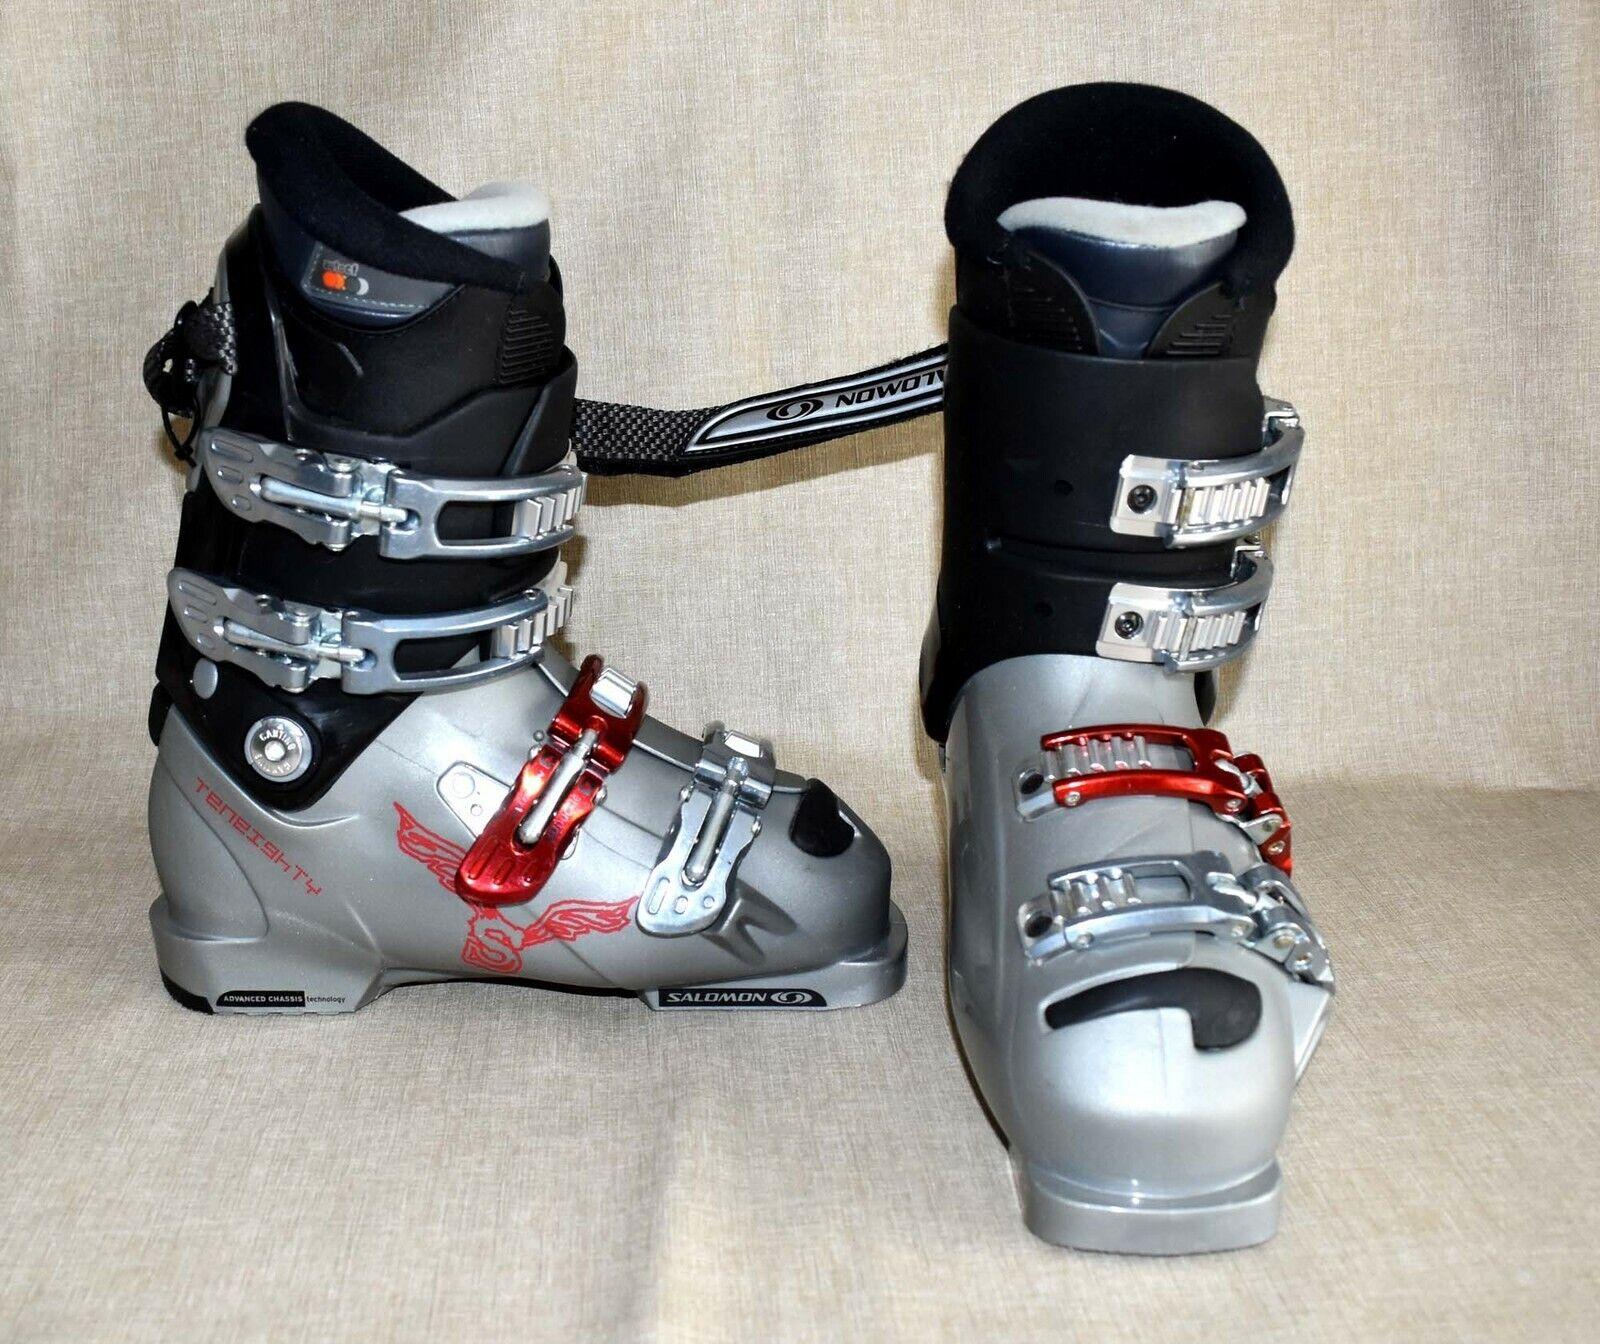 Salomon Tentachtig 1080 Ski laarzen US 6.5 23.5